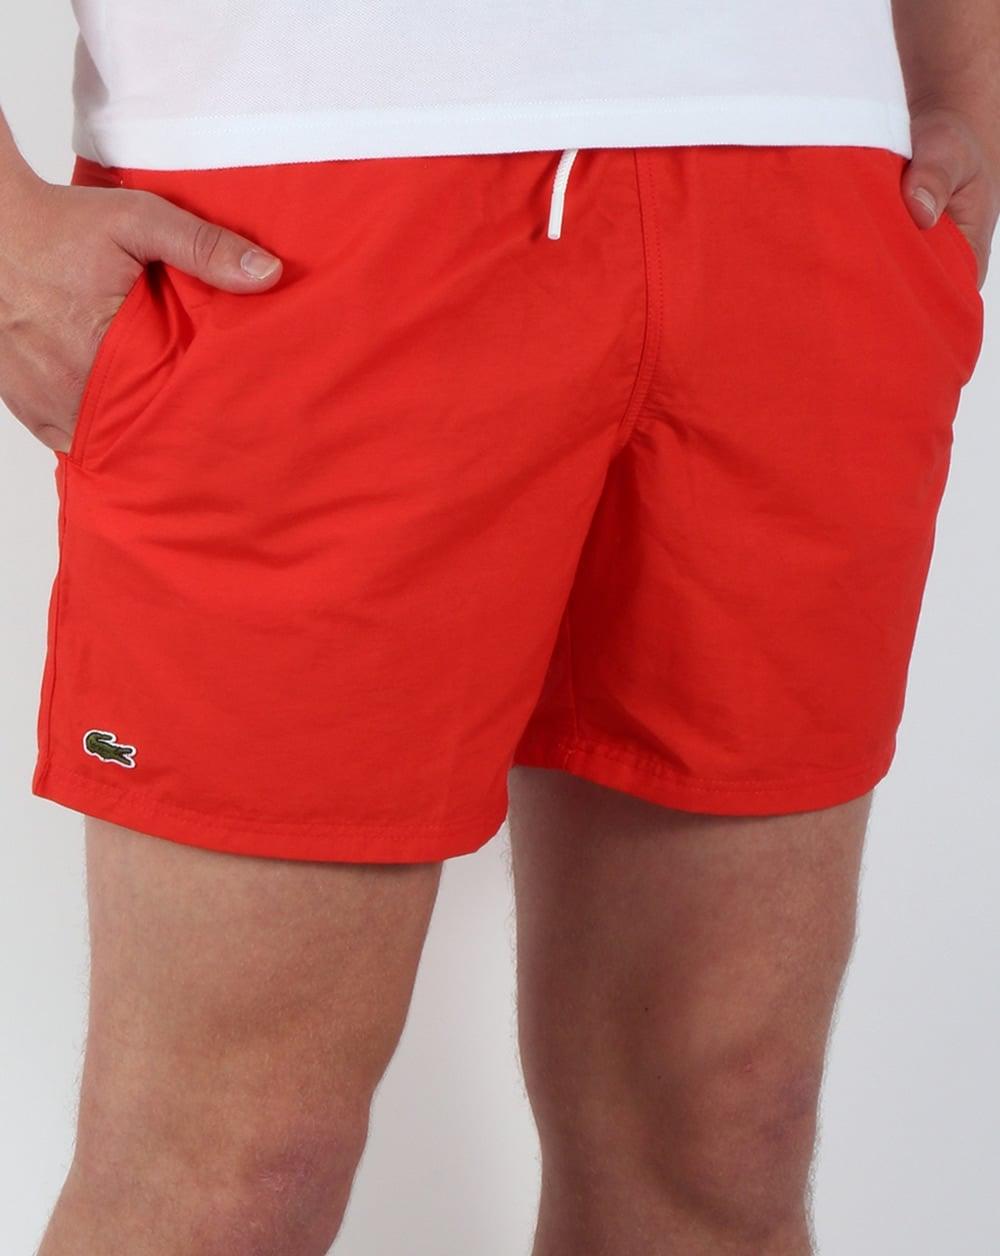 55b3ce6d Lacoste Swim Shorts Red